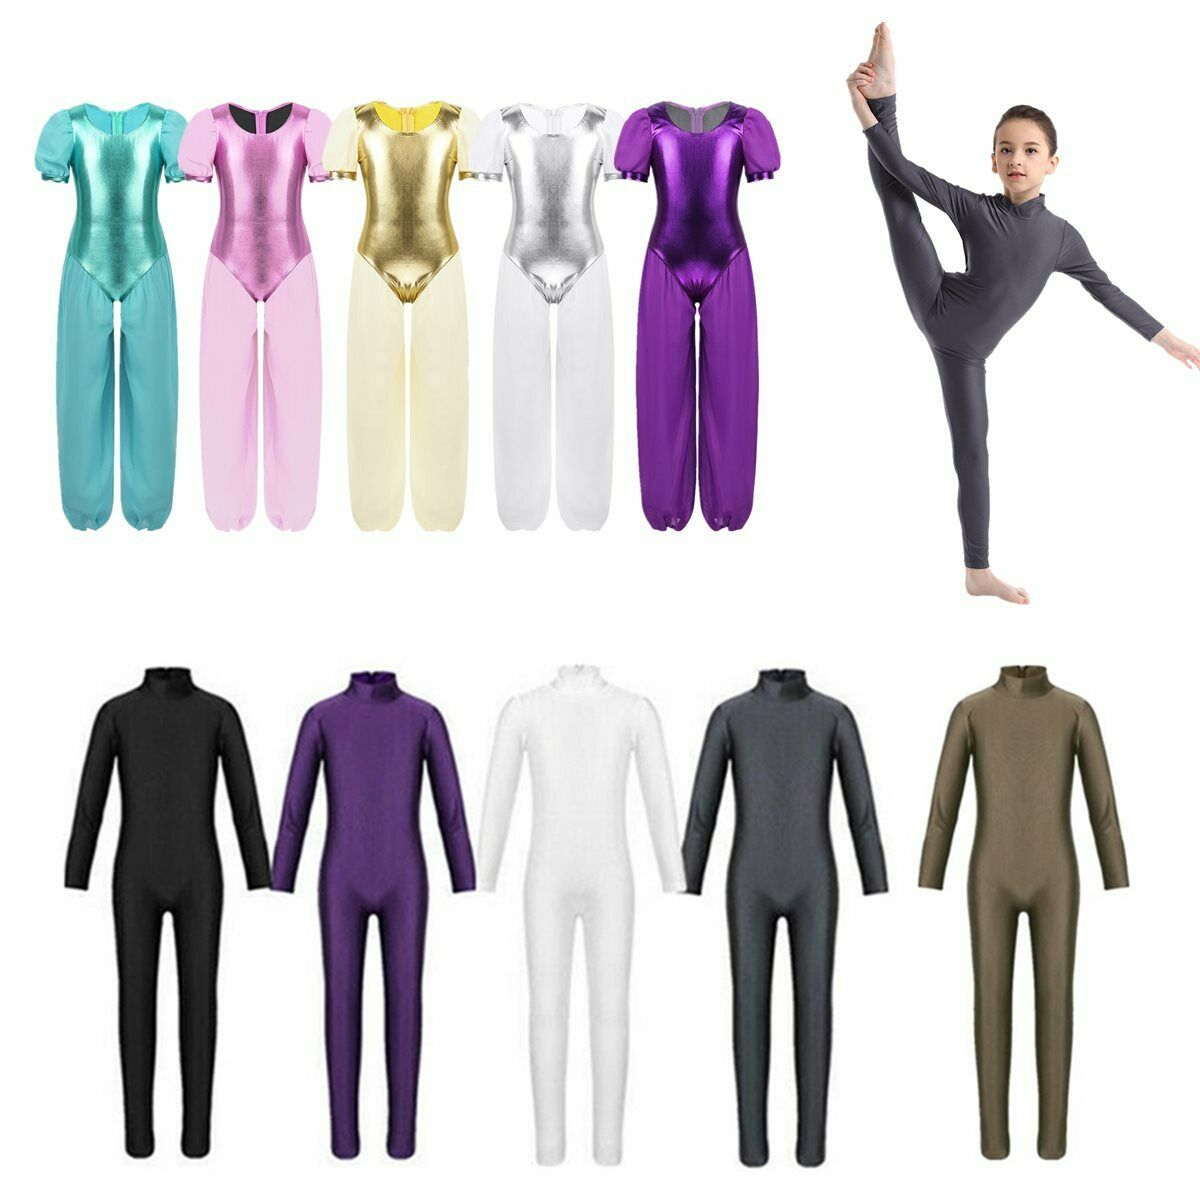 Toddlers Girls Ballet Dance Leotards Gymnastics Long Sleeves Dancewear Jumpsuits